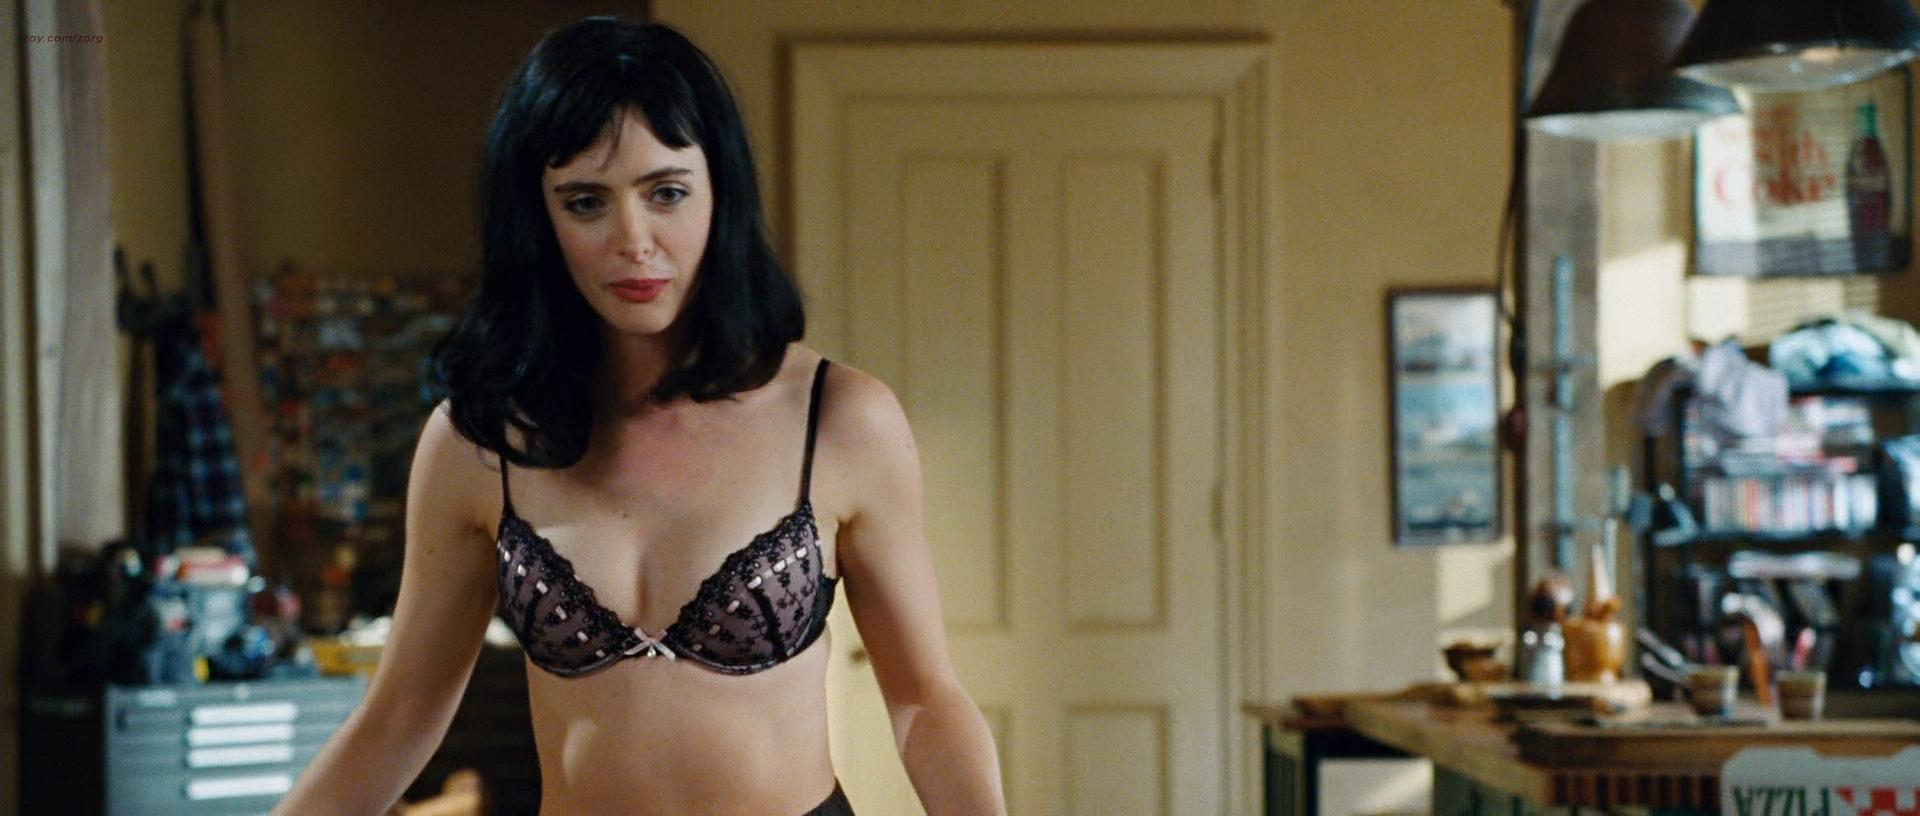 Cameron Diaz hot Krysten Ritter lingerie and Lake Bell hot in undies - What Happens In Vegas (2008) hd1080p (13)